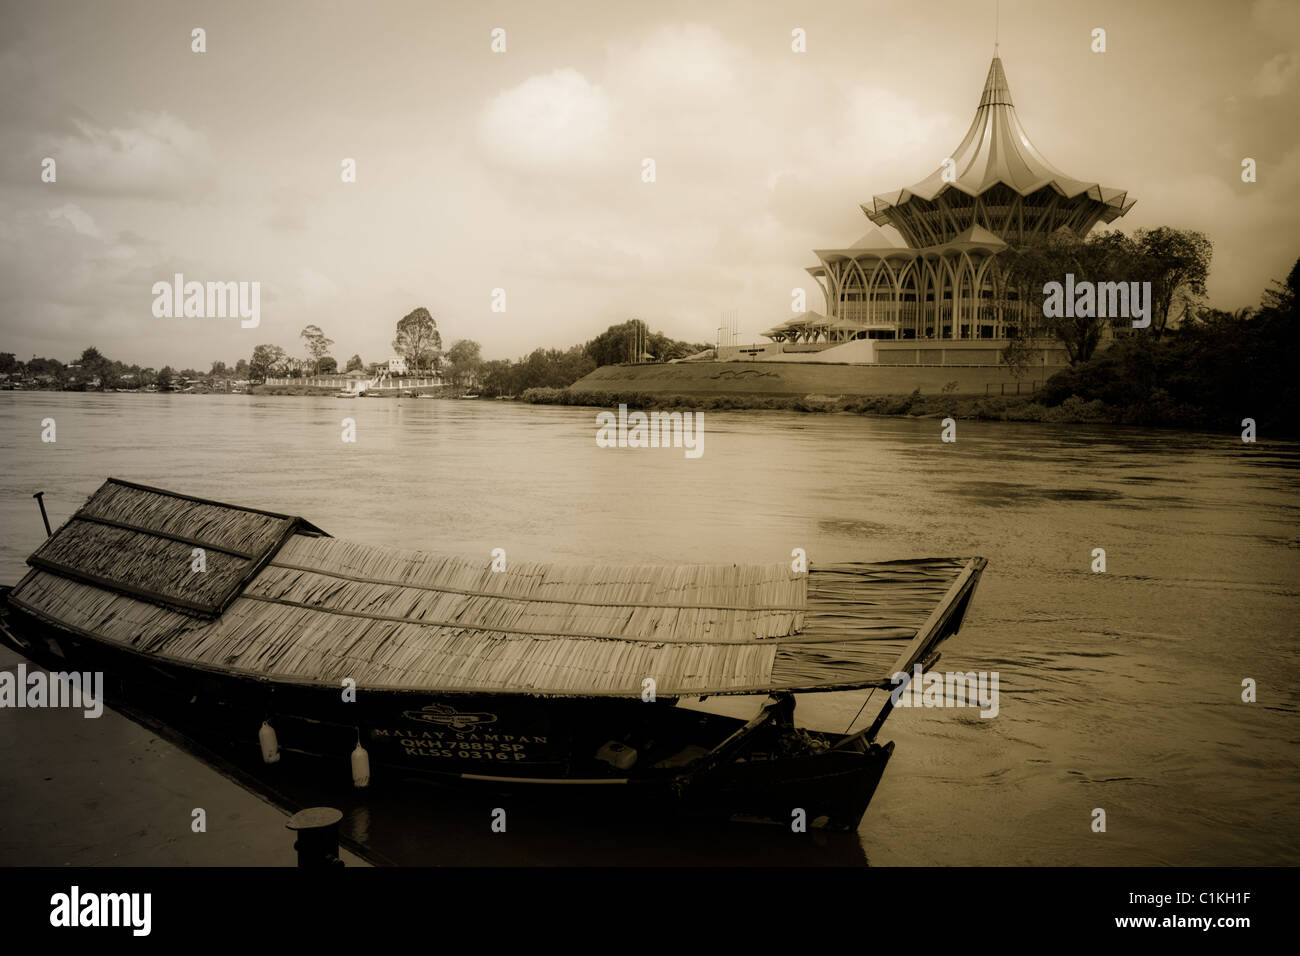 Old-time sampan and state legislative assembly, sarawak river, Kuching - Stock Image